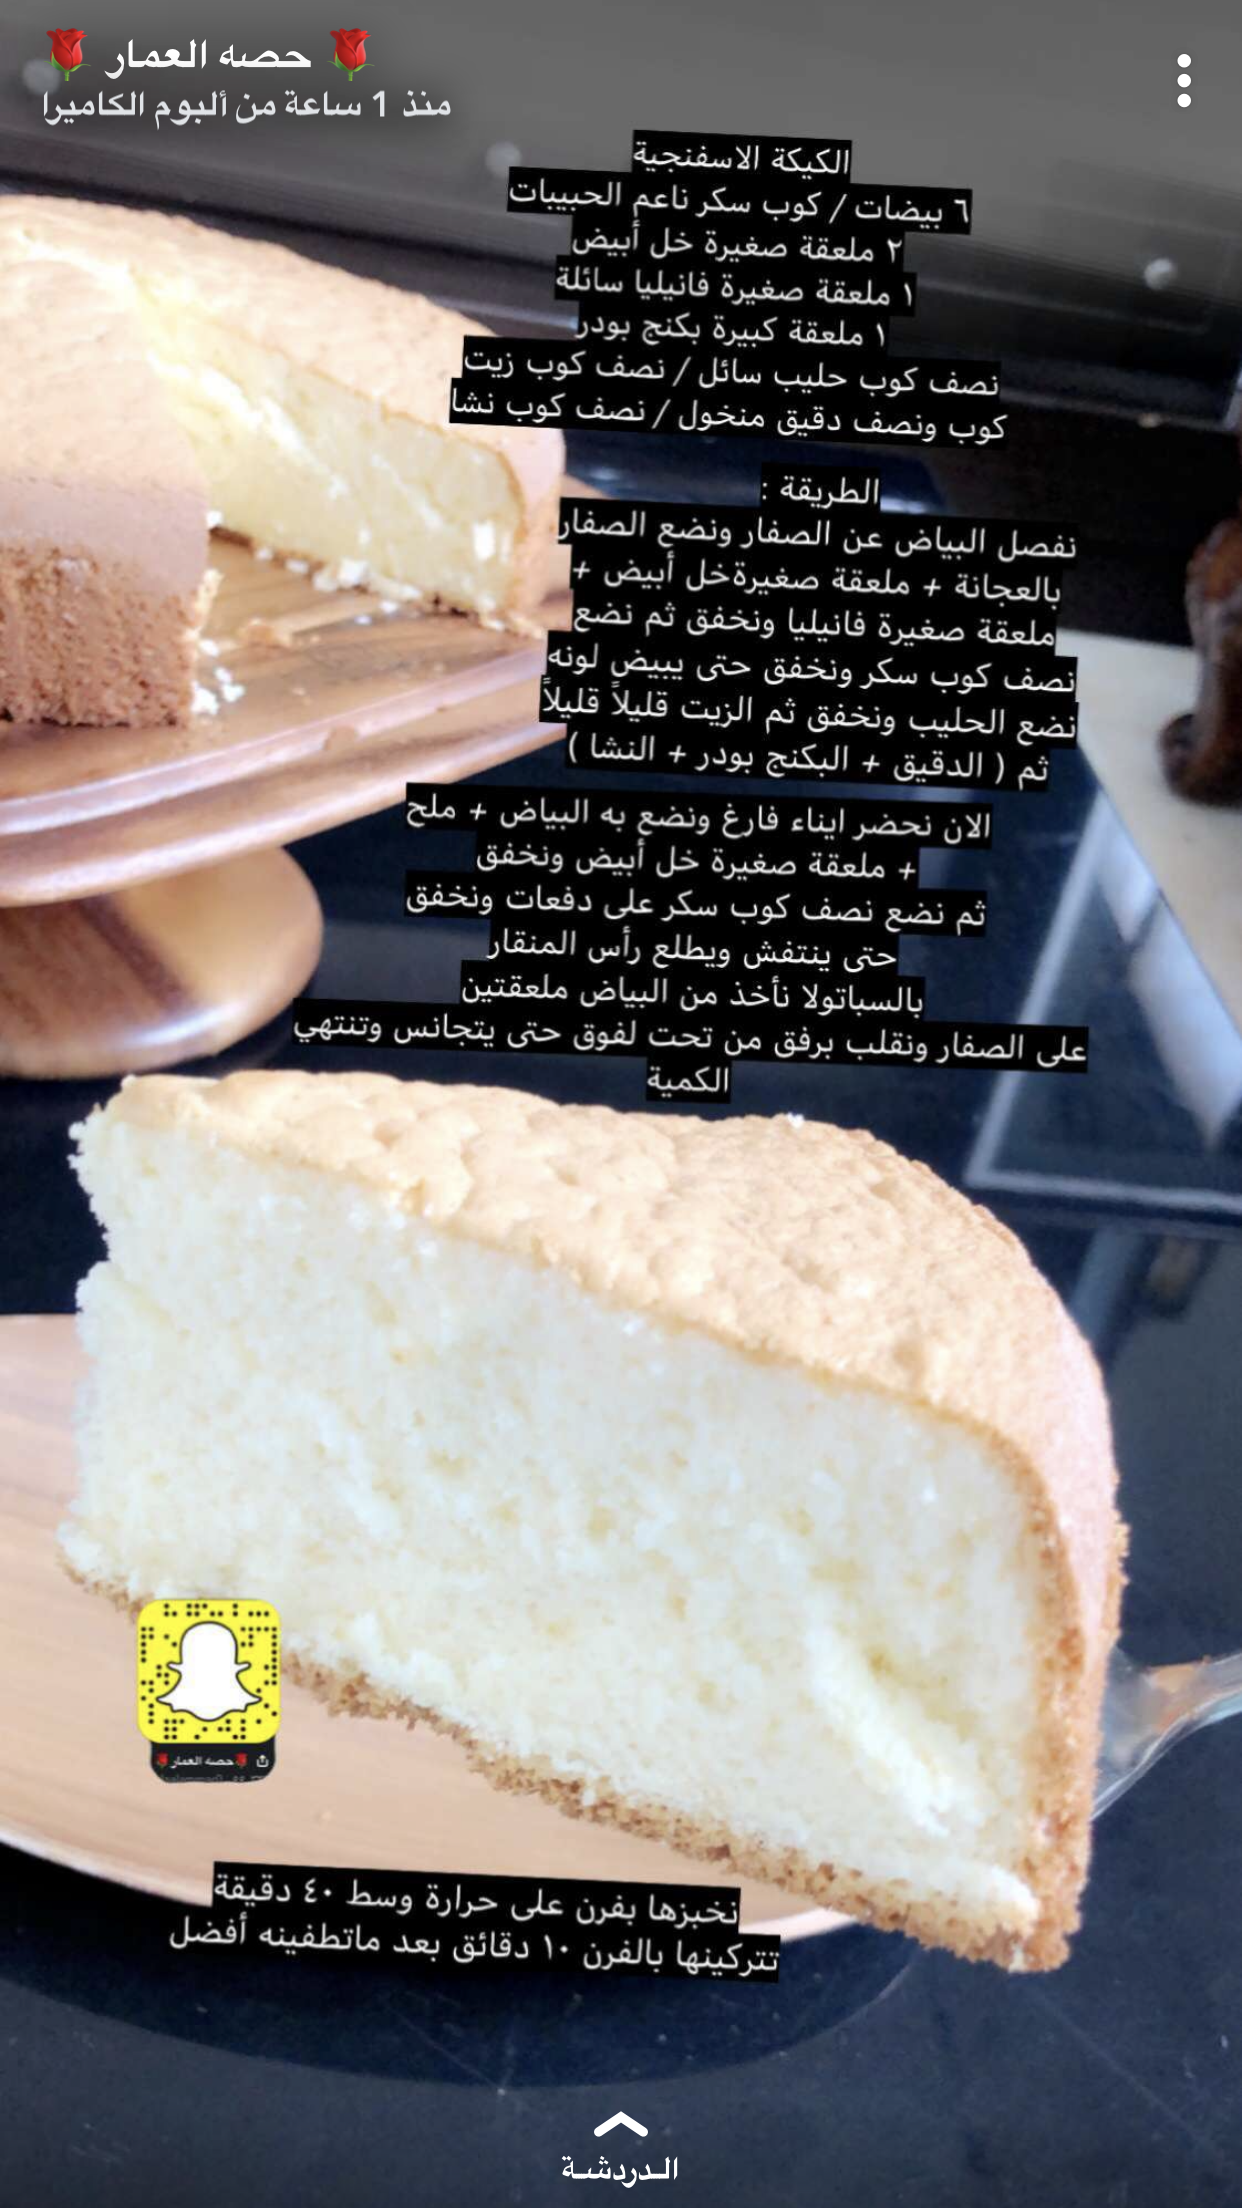 Pin By Jojo On Sweet In 2020 Fun Baking Recipes Cooking Recipes Desserts Arabic Sweets Recipes